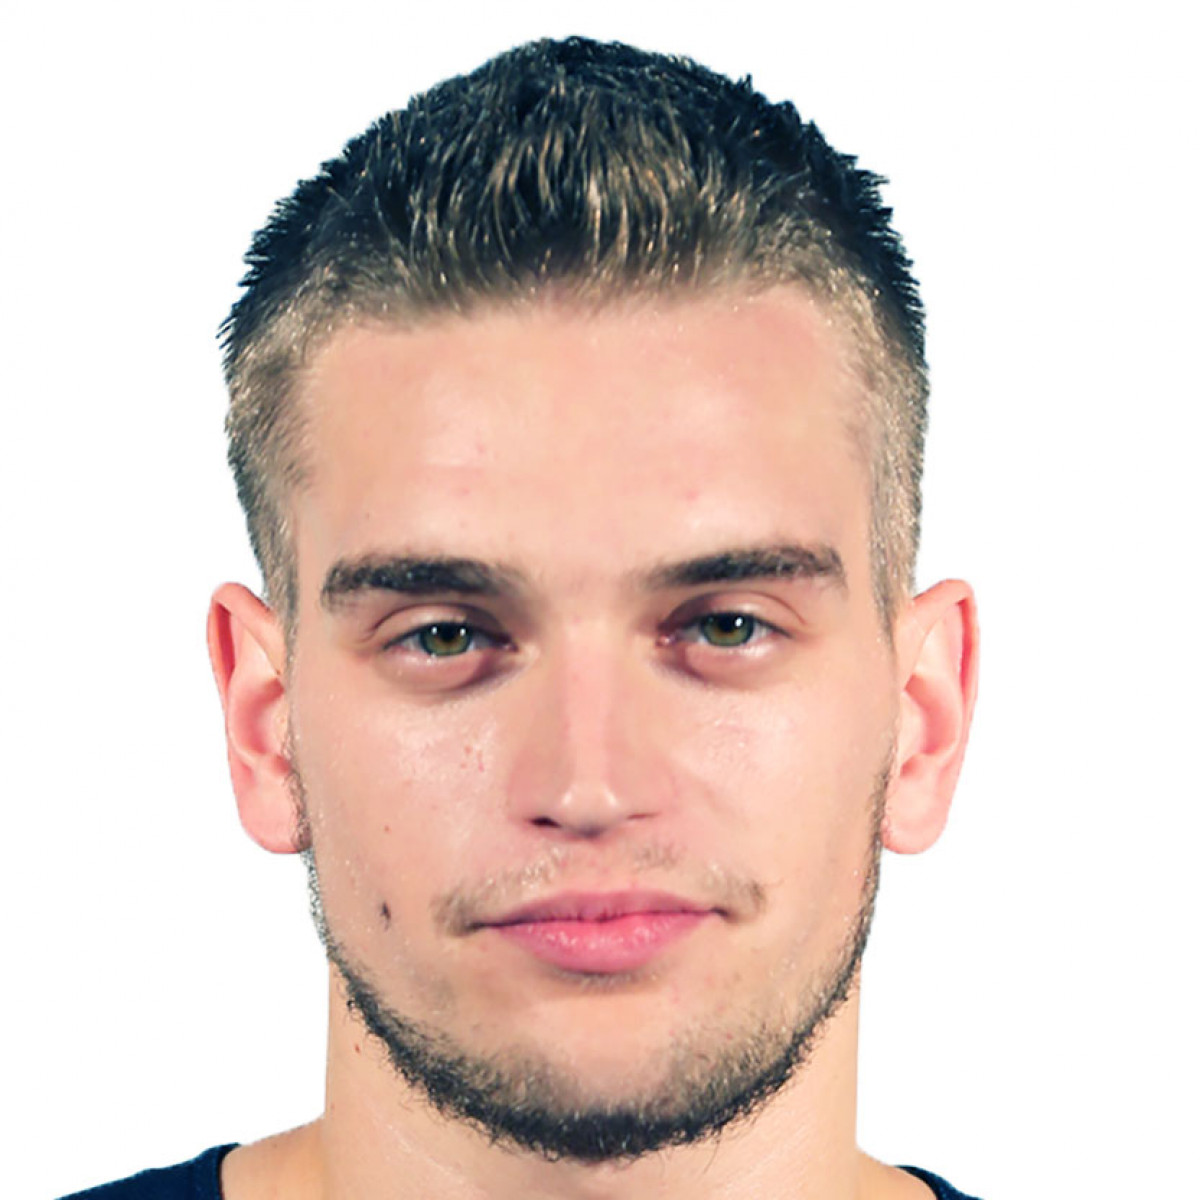 Antonio Jularic